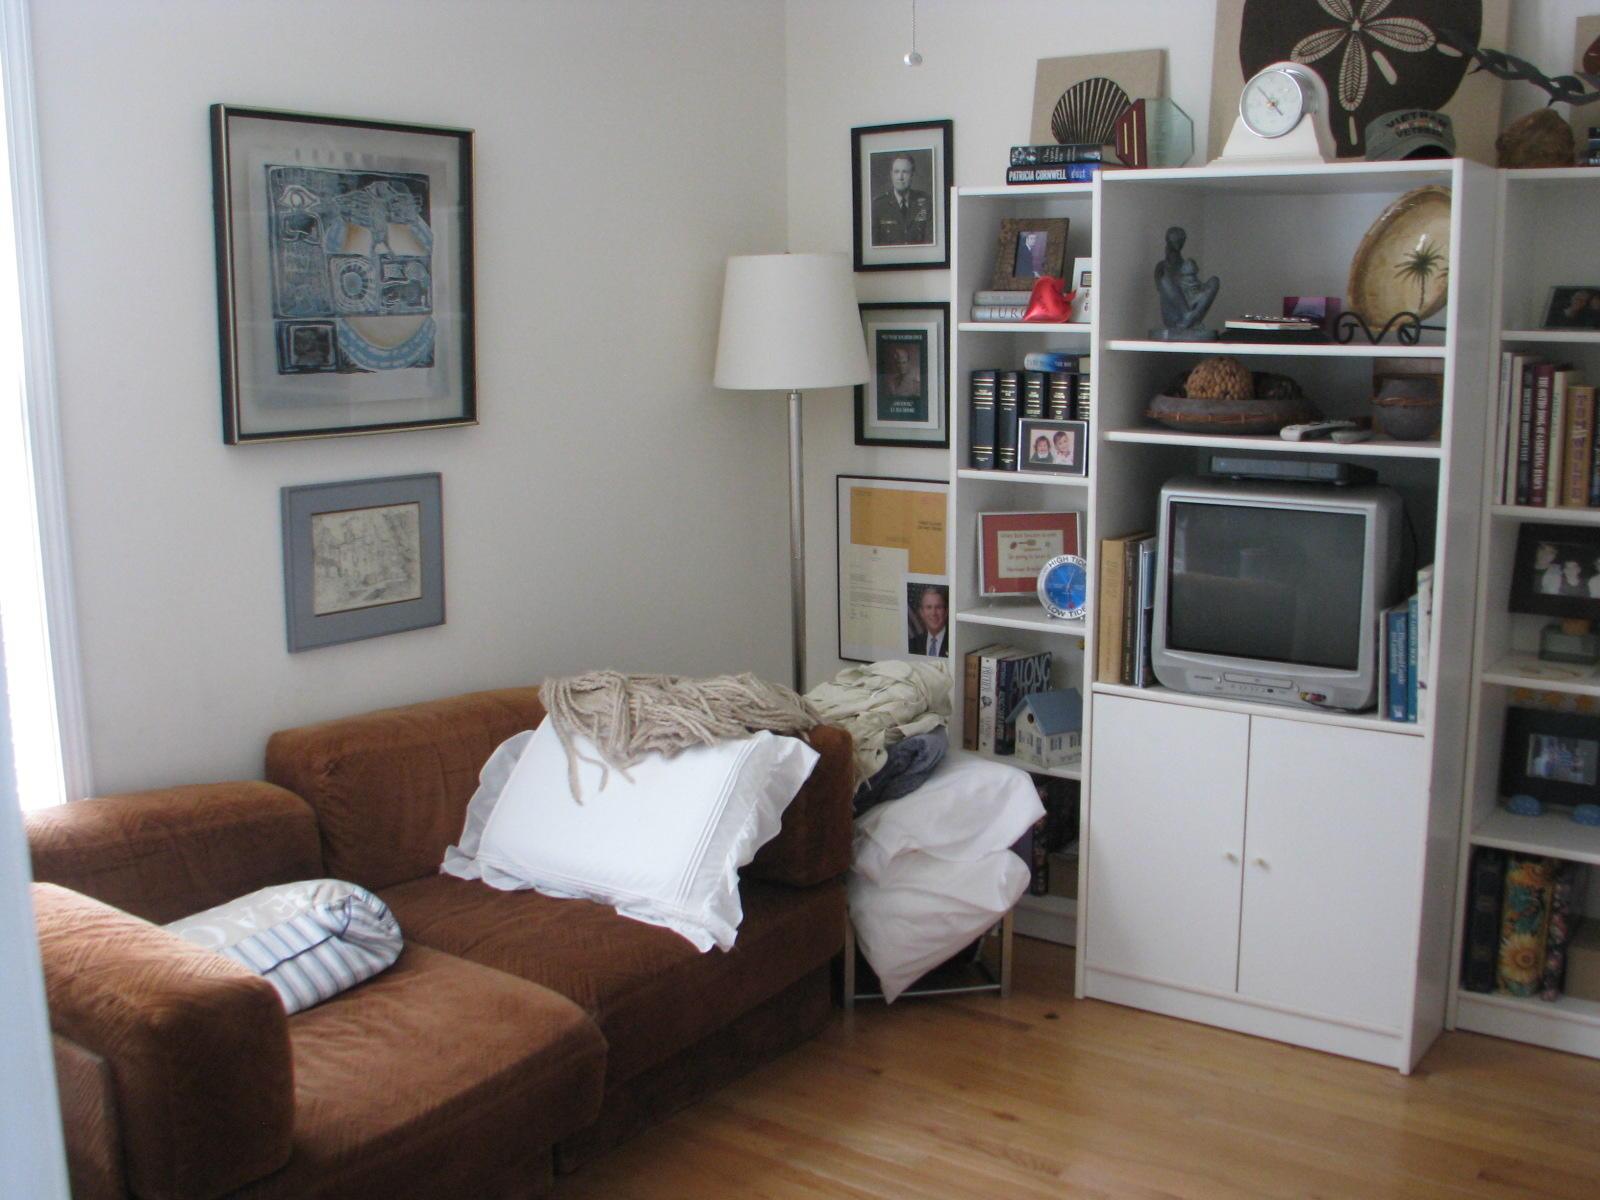 Hamlin Park Homes For Sale - 1407 Hamlin Park, Mount Pleasant, SC - 5